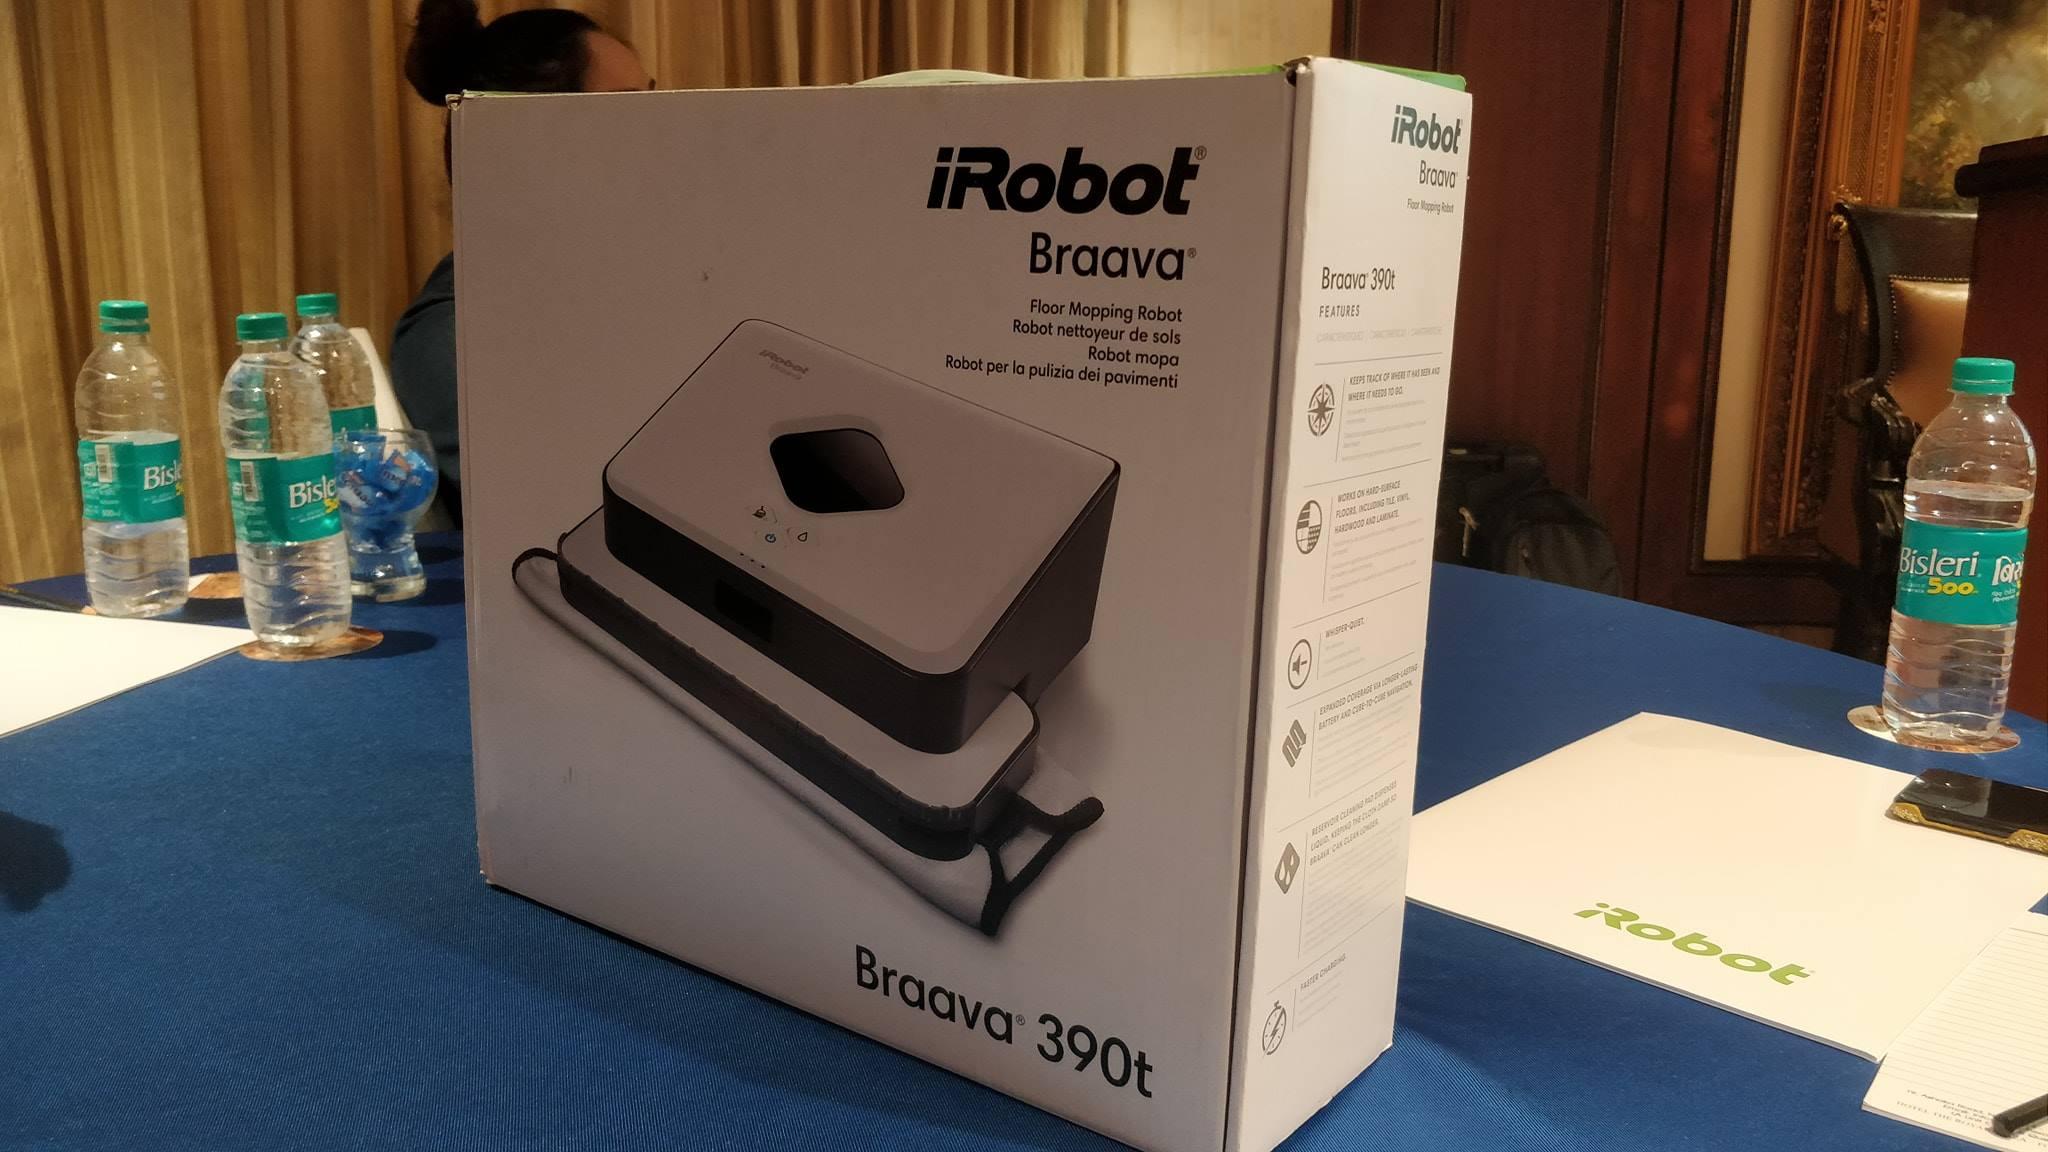 Braava 390t Mopping Robot